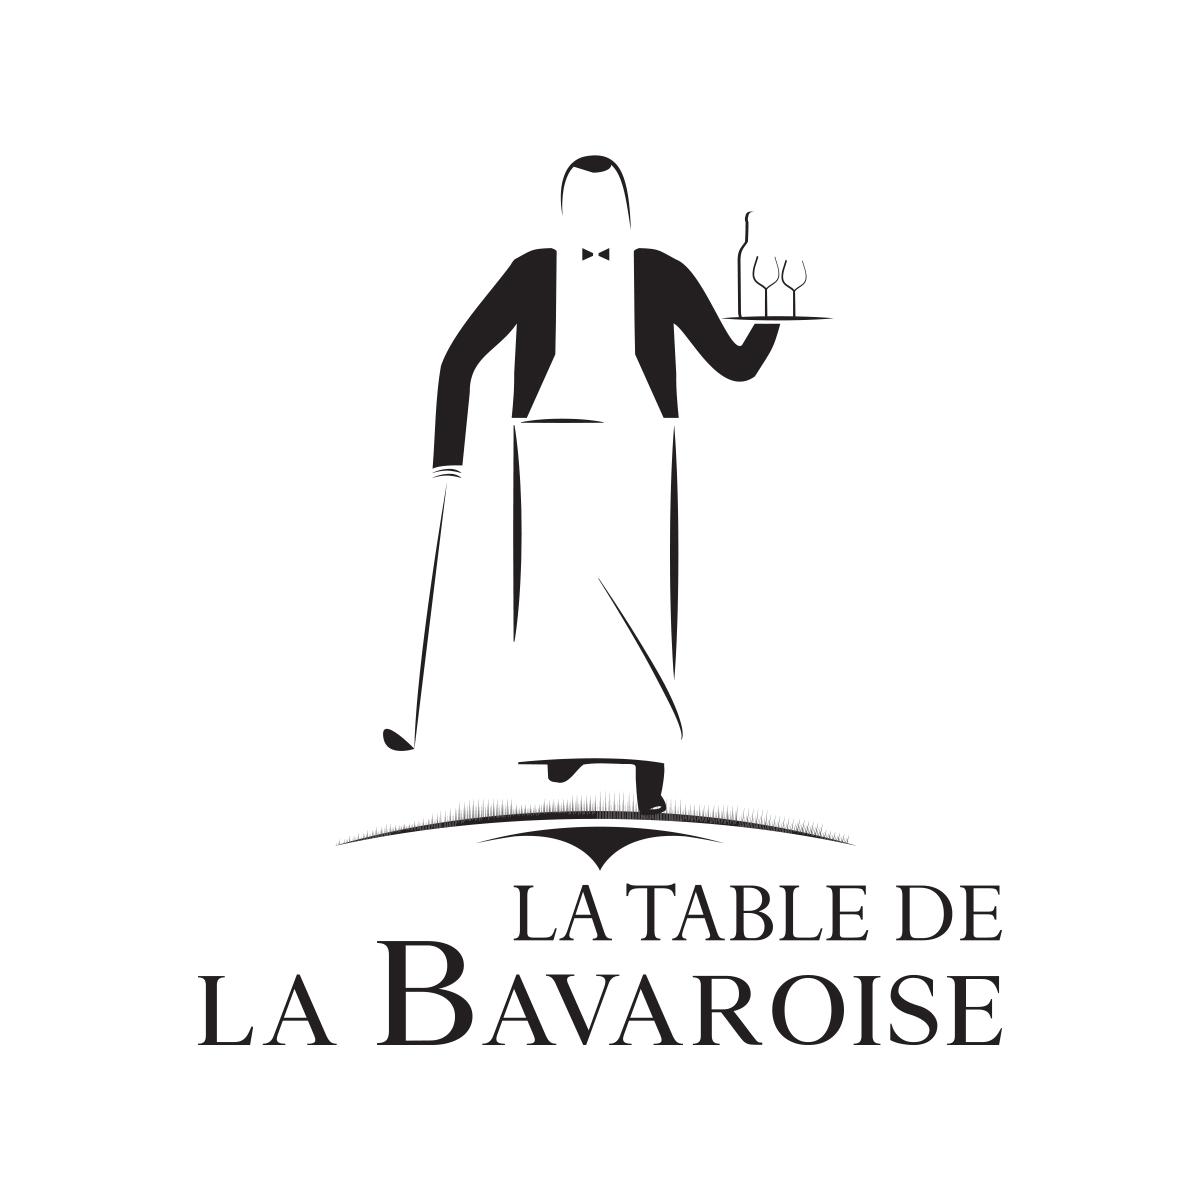 LA TABLE BAVAROISE